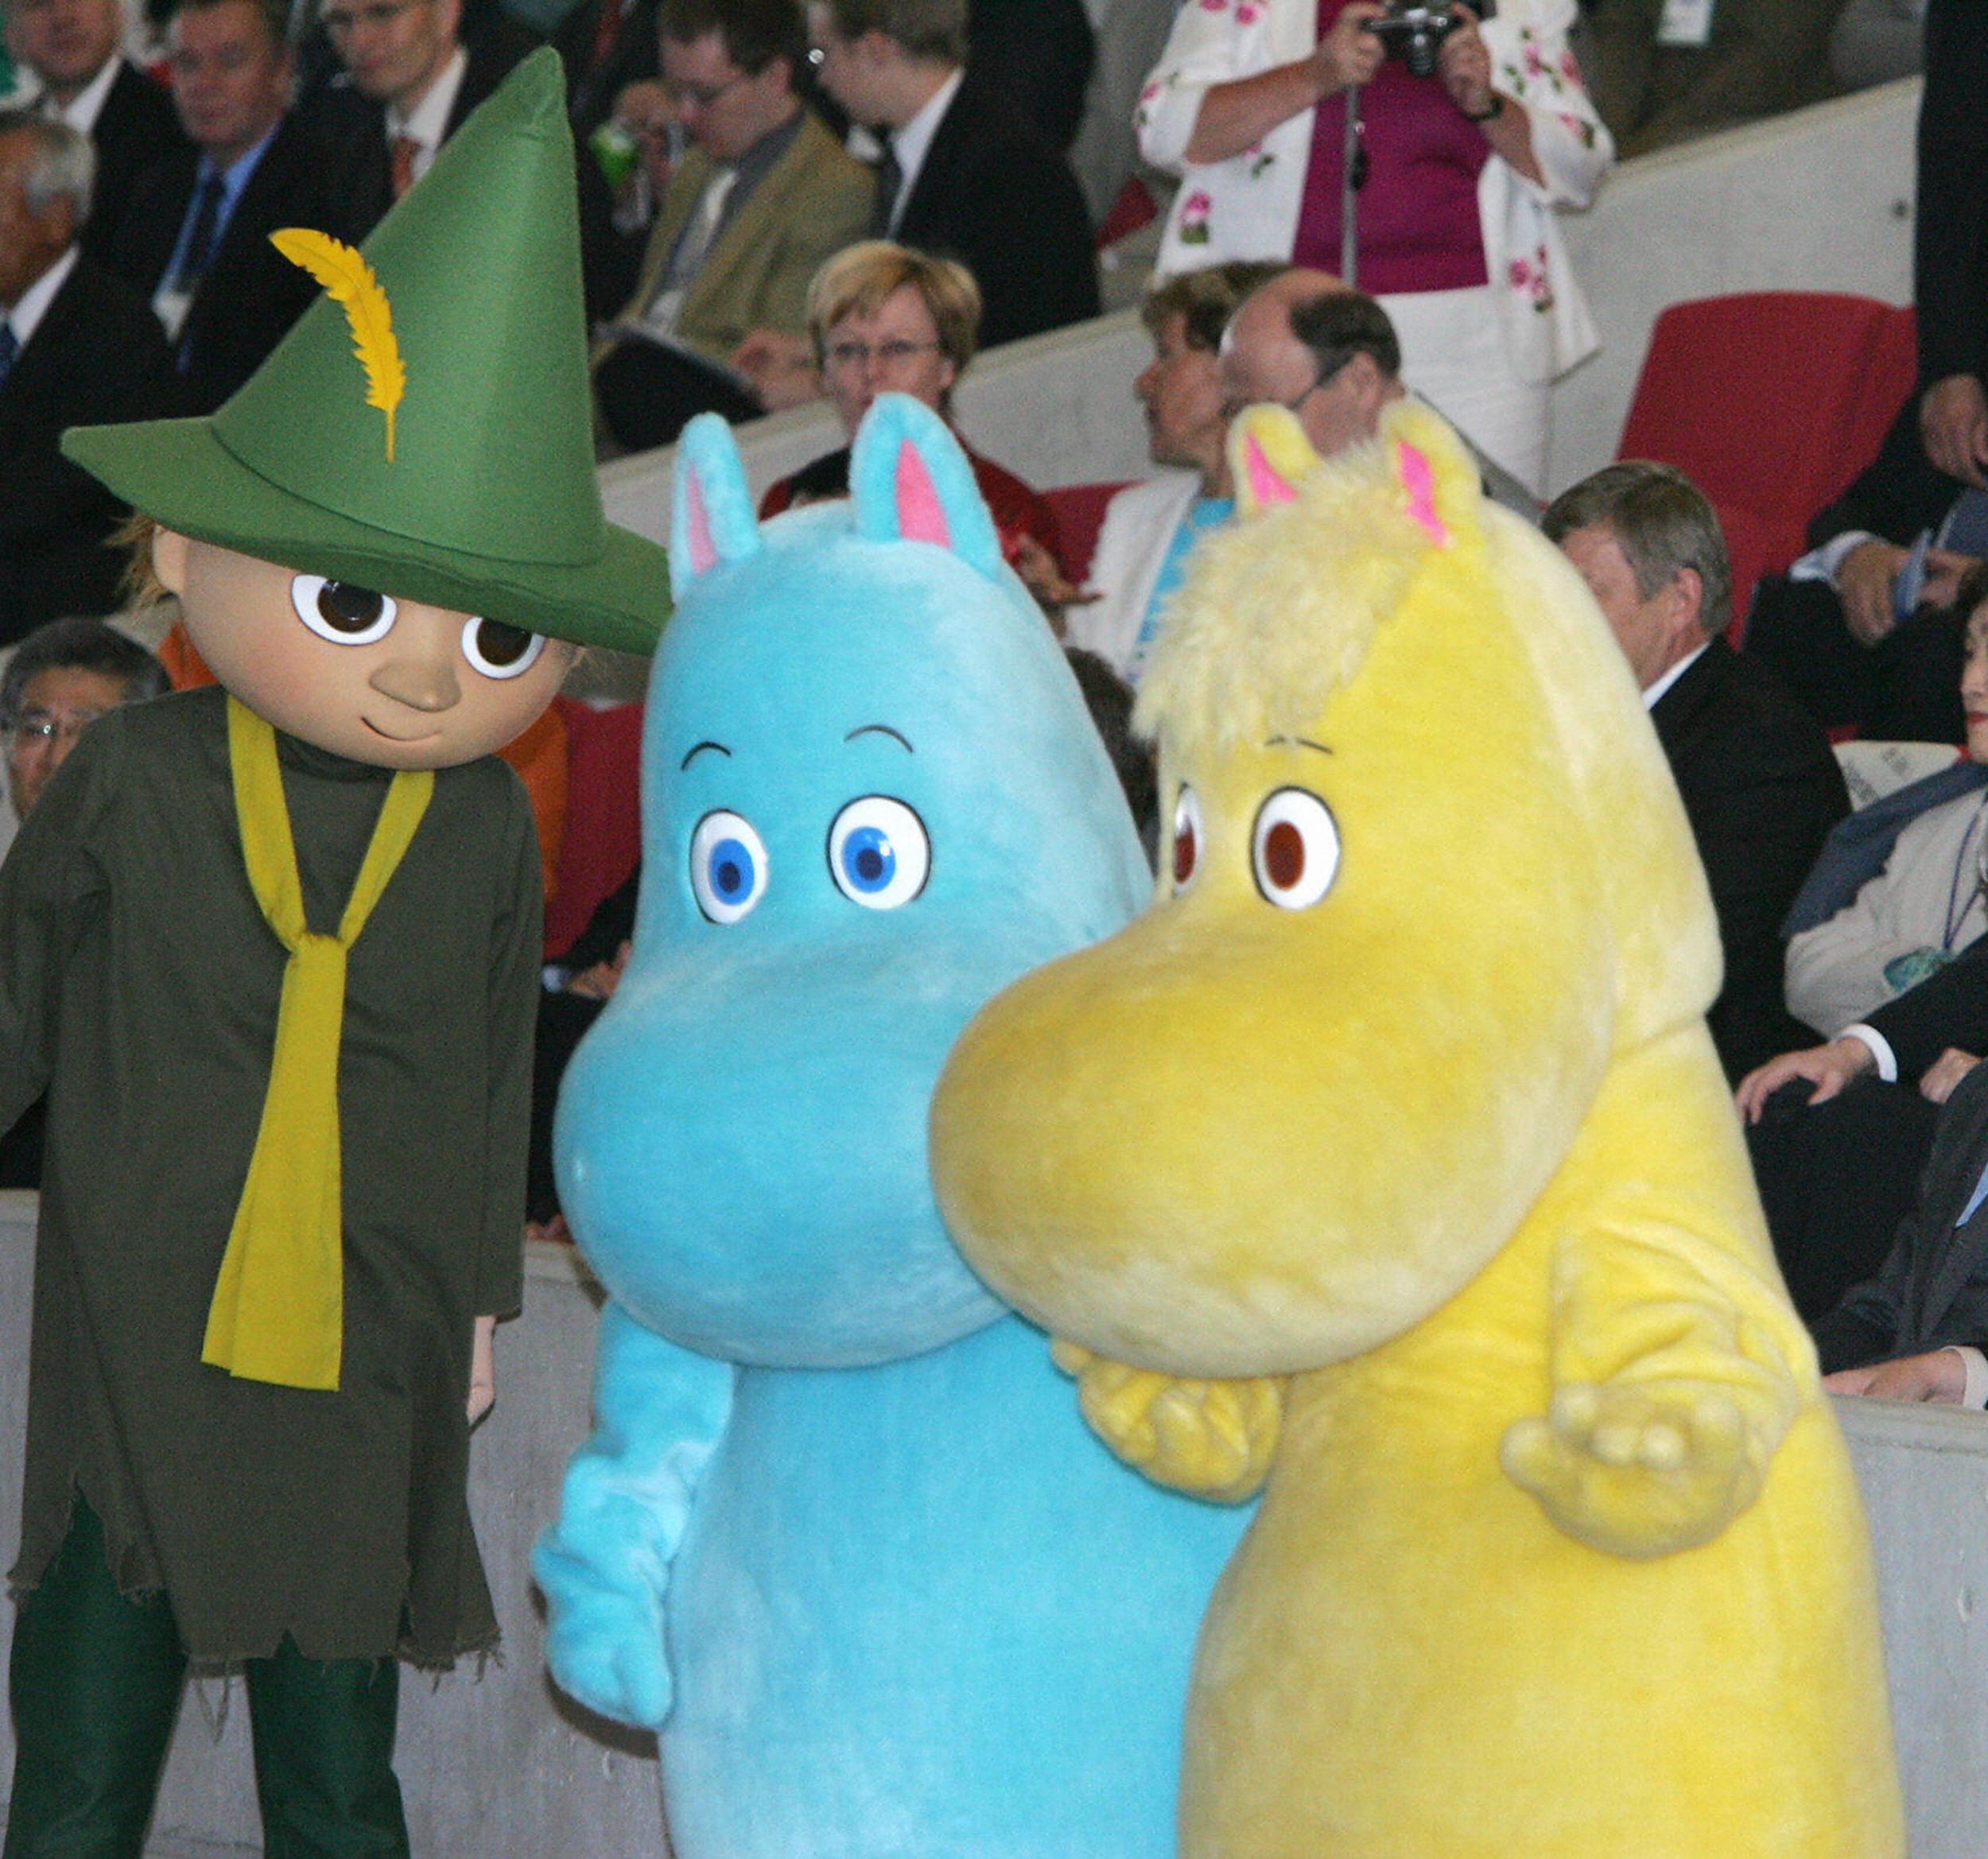 Image: Stuffed toys Moomin, the famous Finnish cartoon characters.